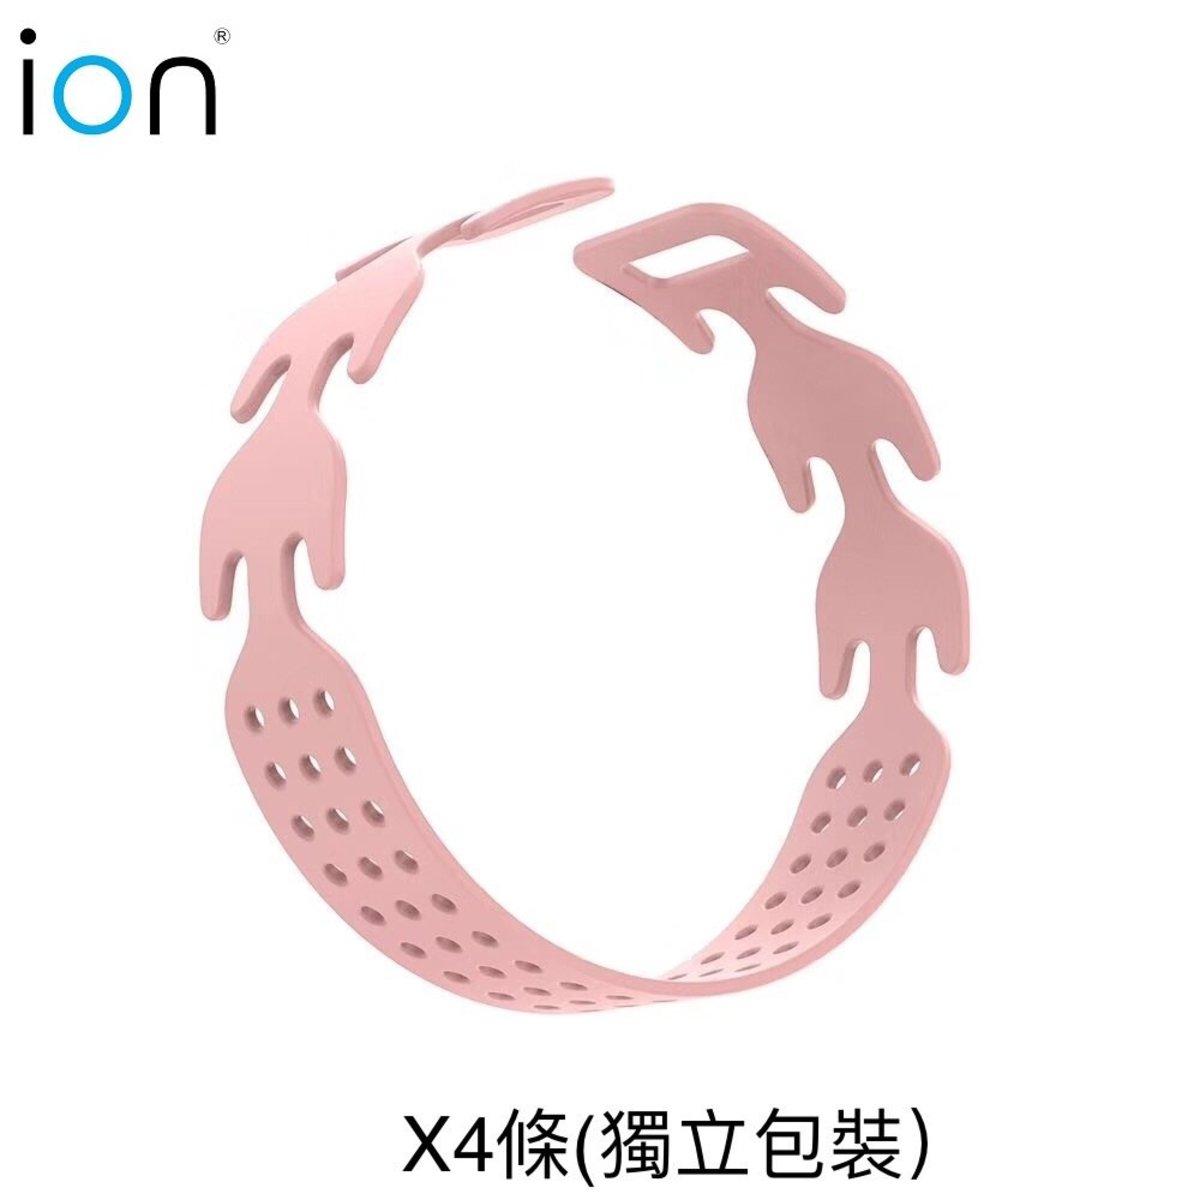 Six-segment Mask Anti-Stress Decompression Comfort Band